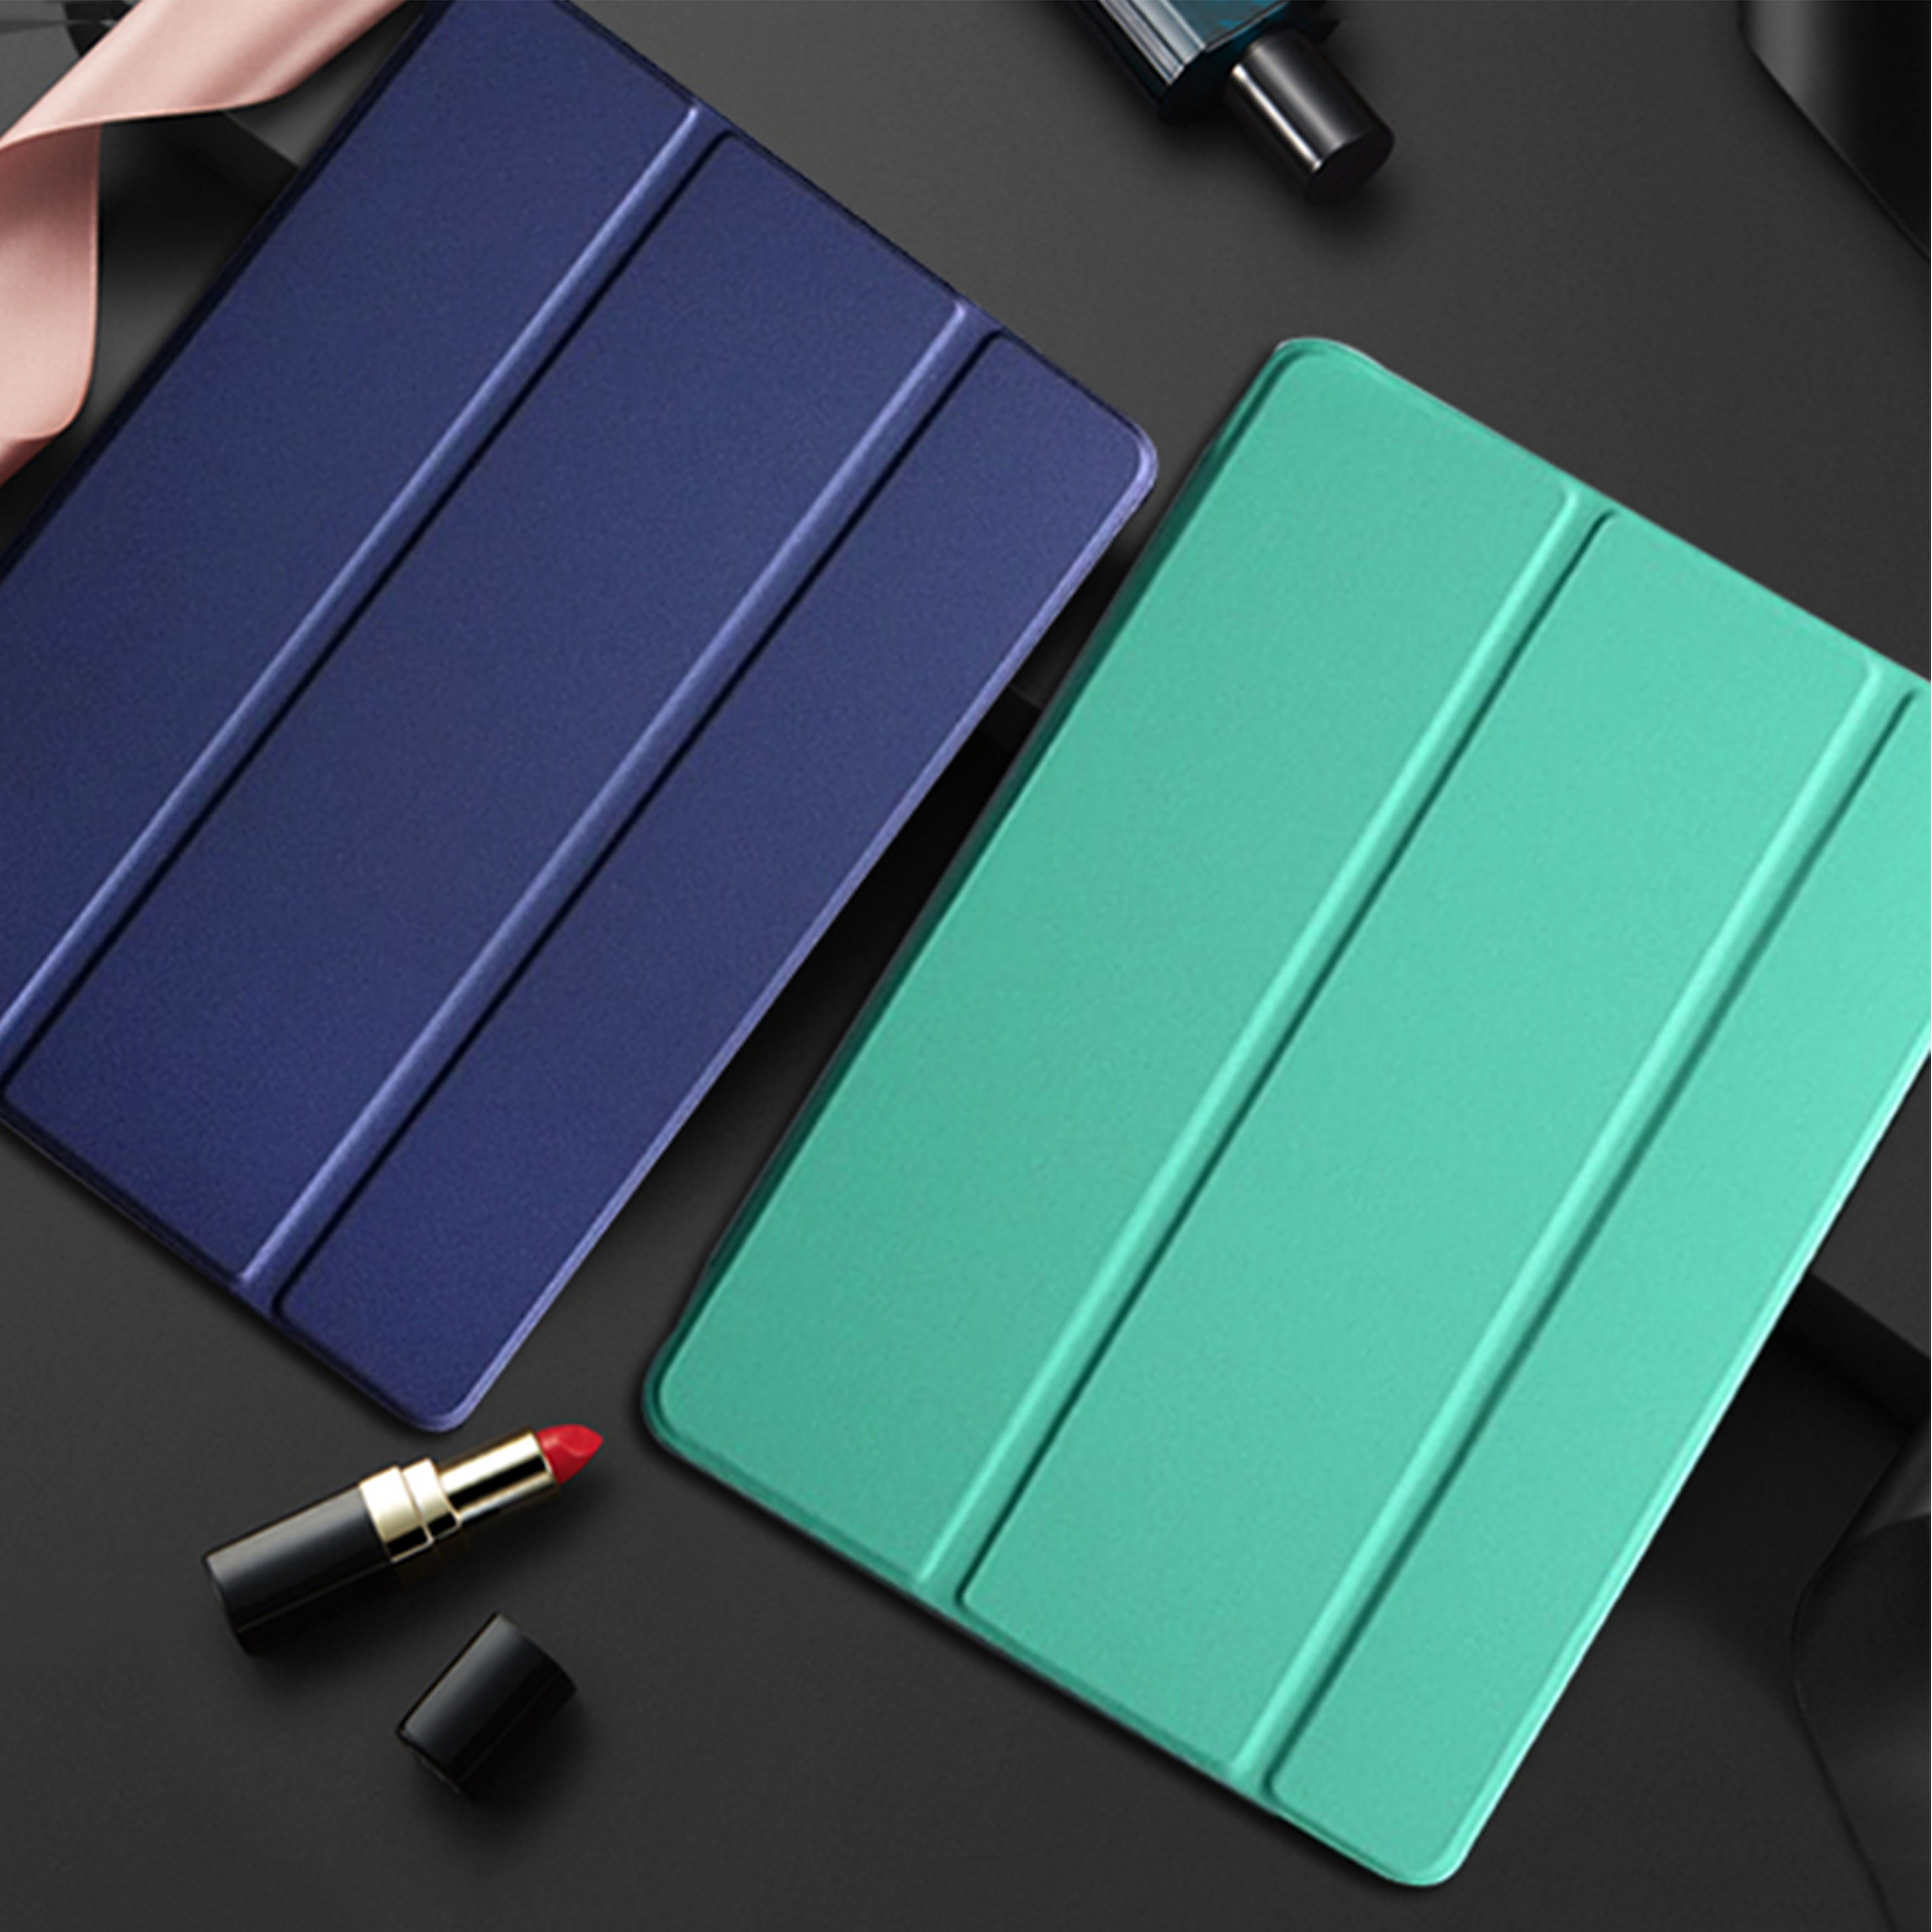 Case For Huawei MediaPad T3 7 Wifi BG2-W09 7.0